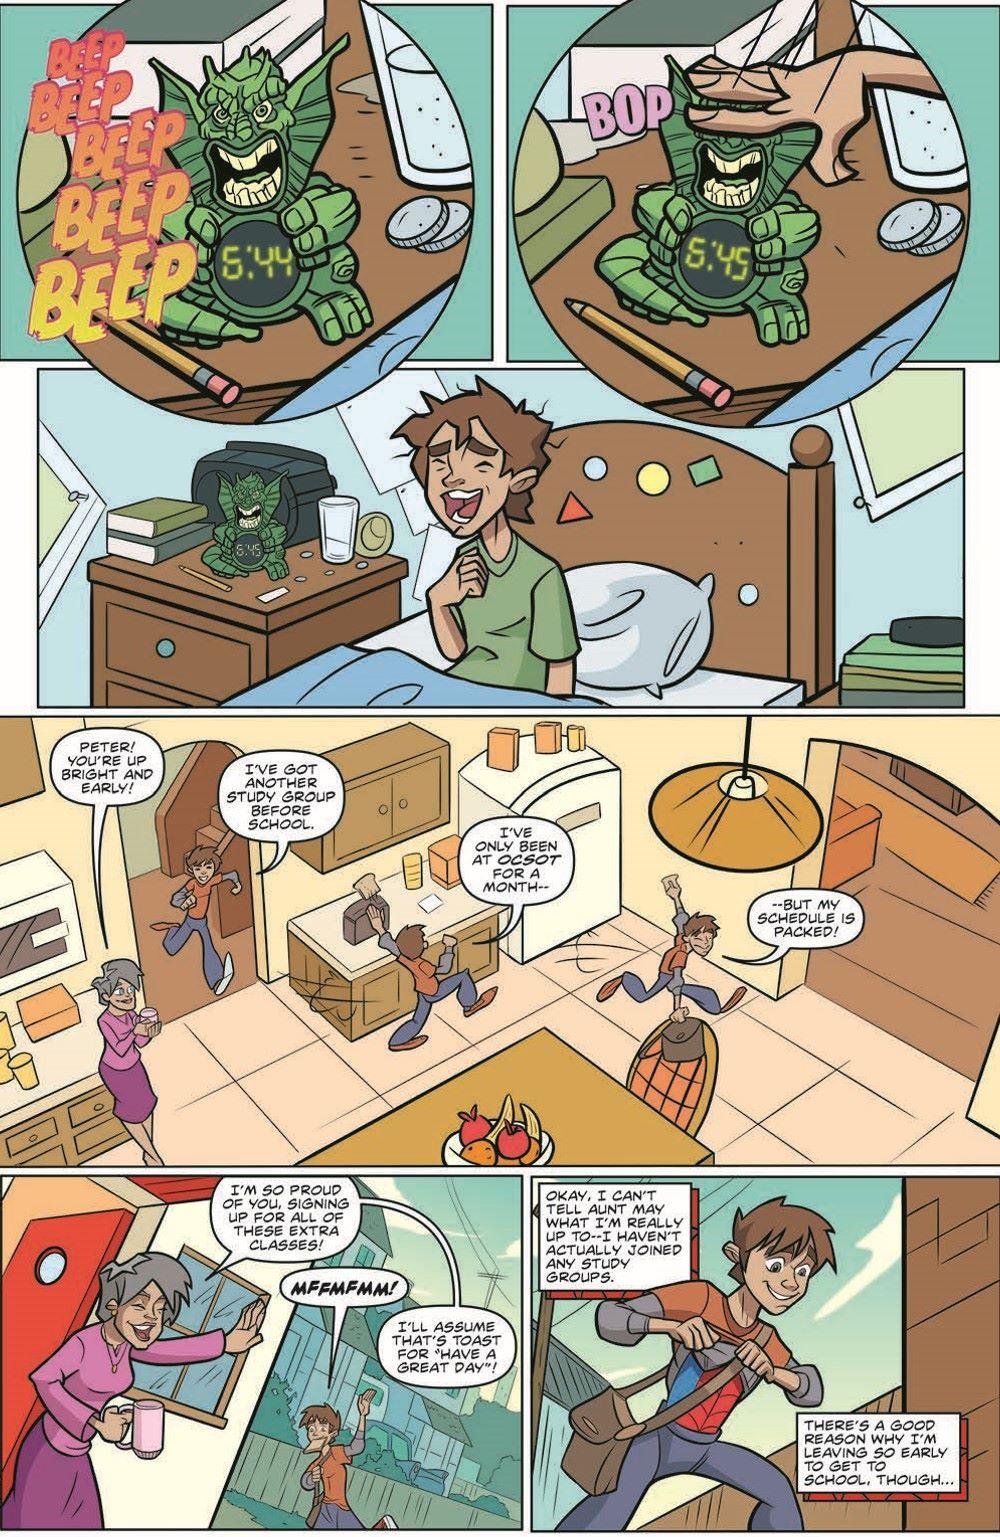 SpidermanV3-01_pr-3 ComicList Previews: MARVEL ACTION SPIDER-MAN VOLUME 3 #1